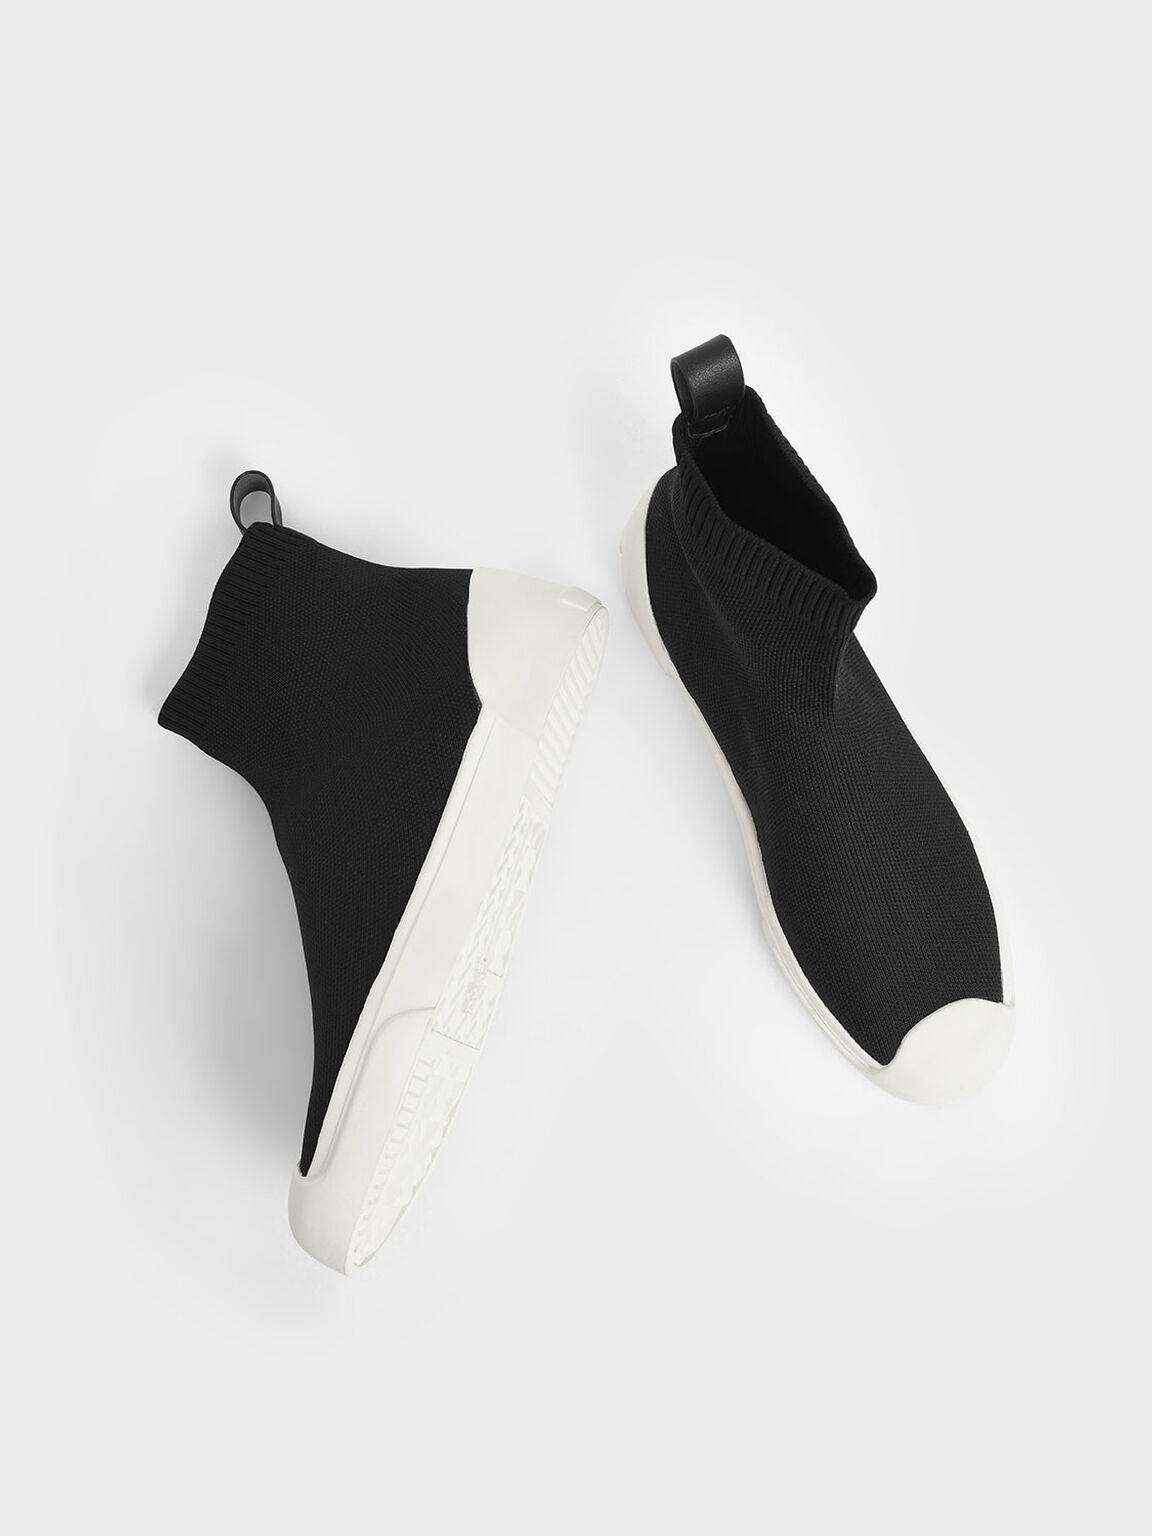 Knitted High Top Slip-On Sneakers, Black, hi-res